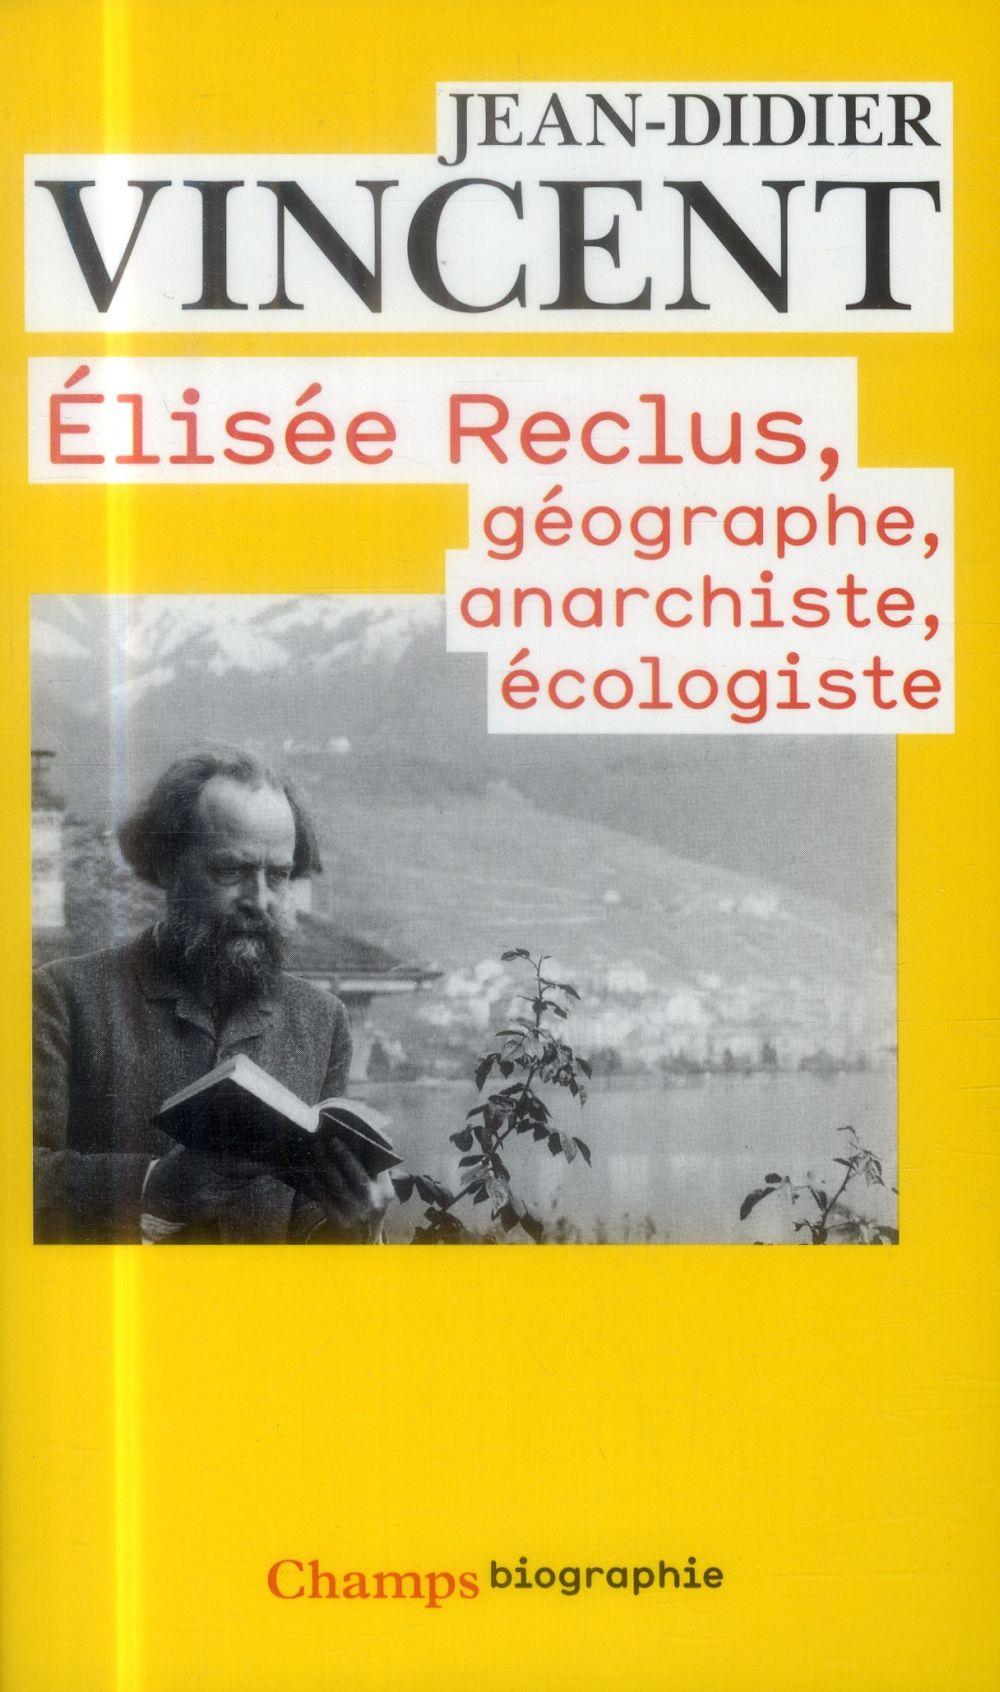 ELISEE RECLUS - GEOGRAPHE, ANA VINCENT JEAN-DIDIER FLAMMARION